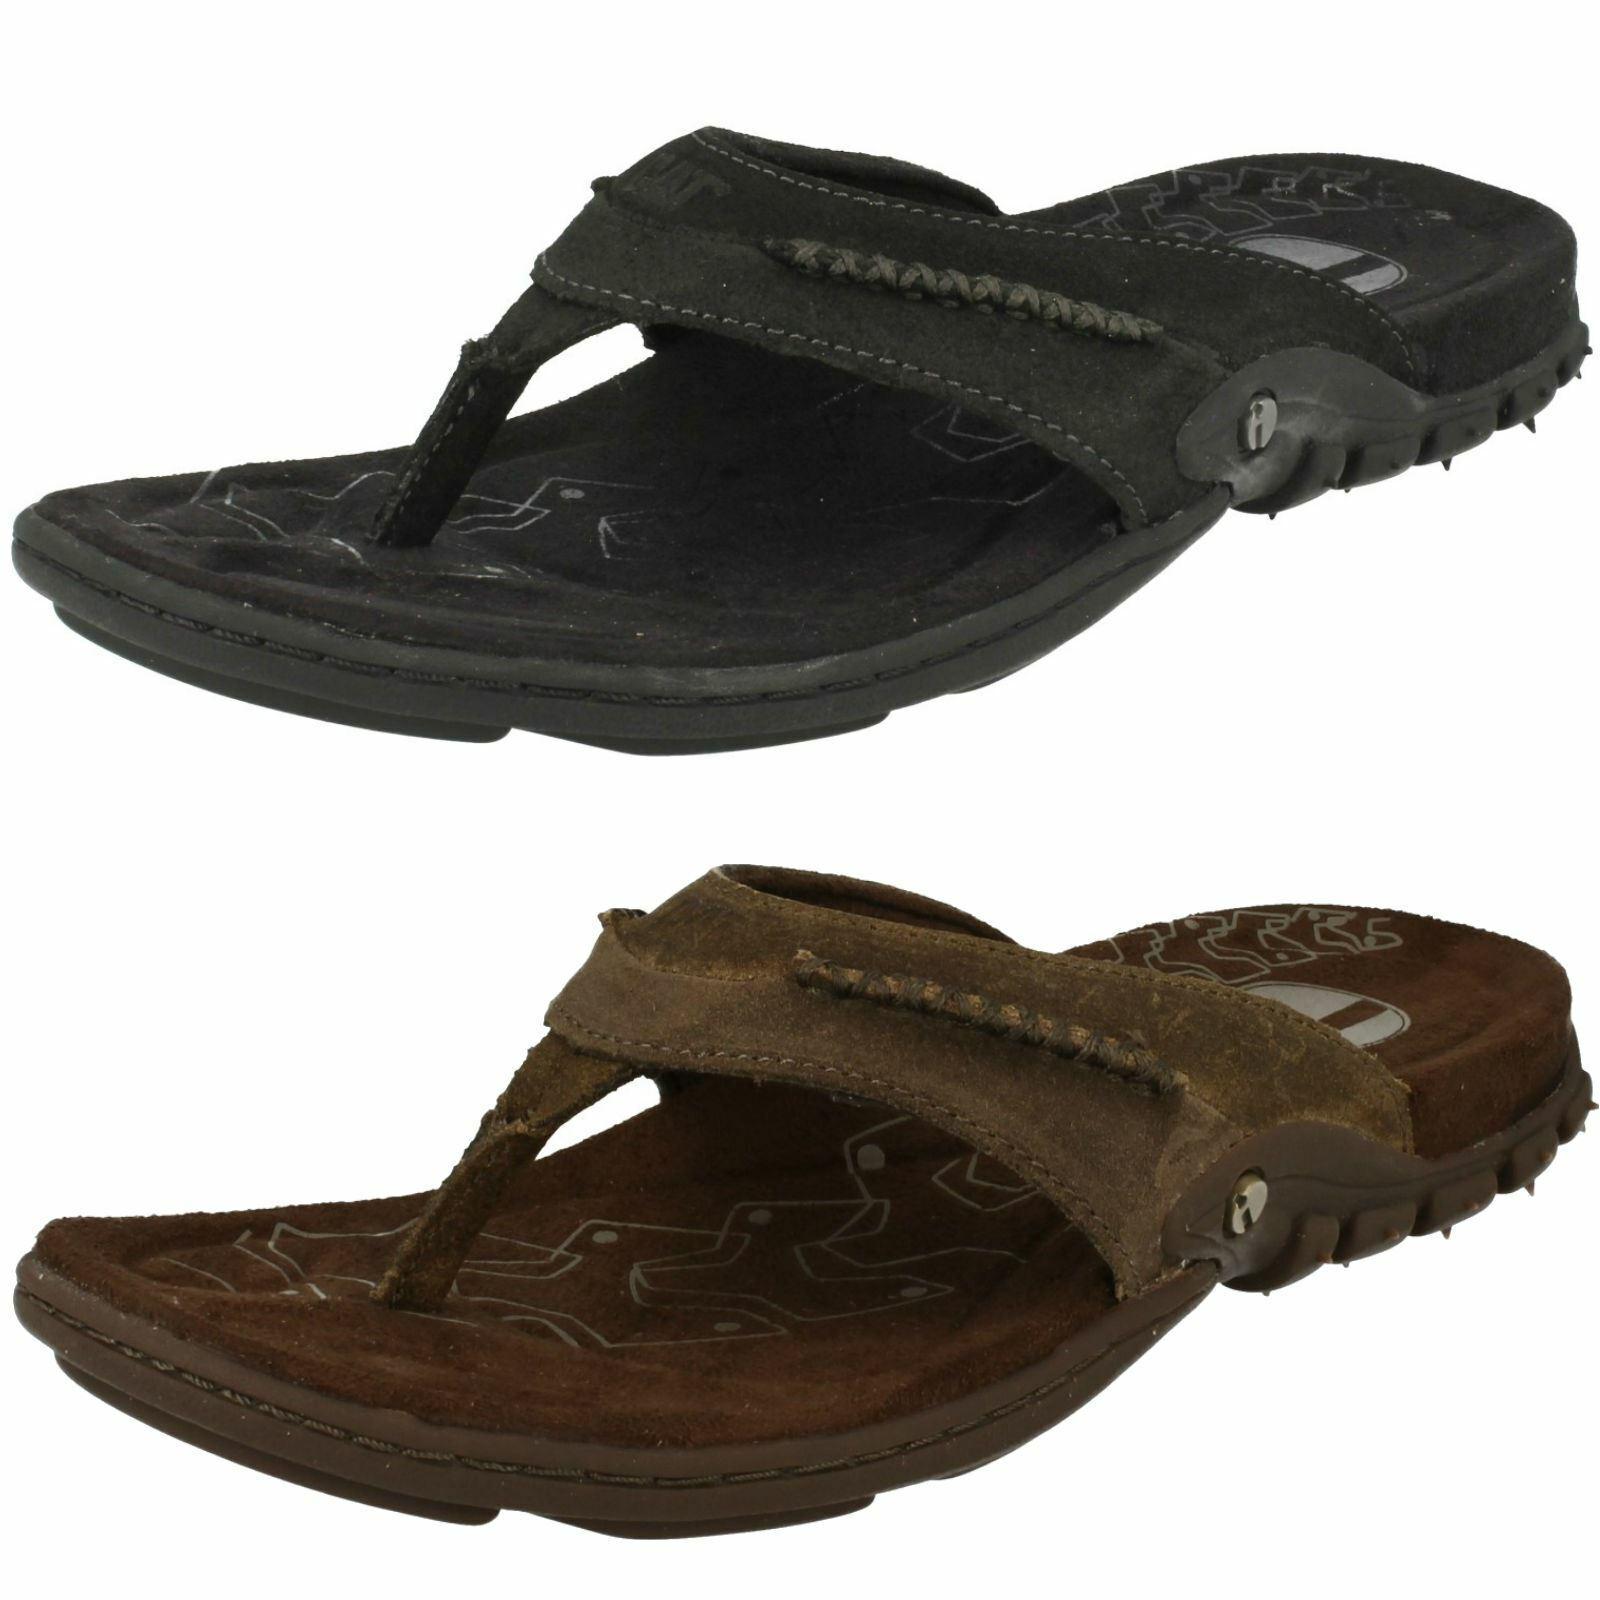 Mens Caterpillar Toe-Post Sandals Pismo